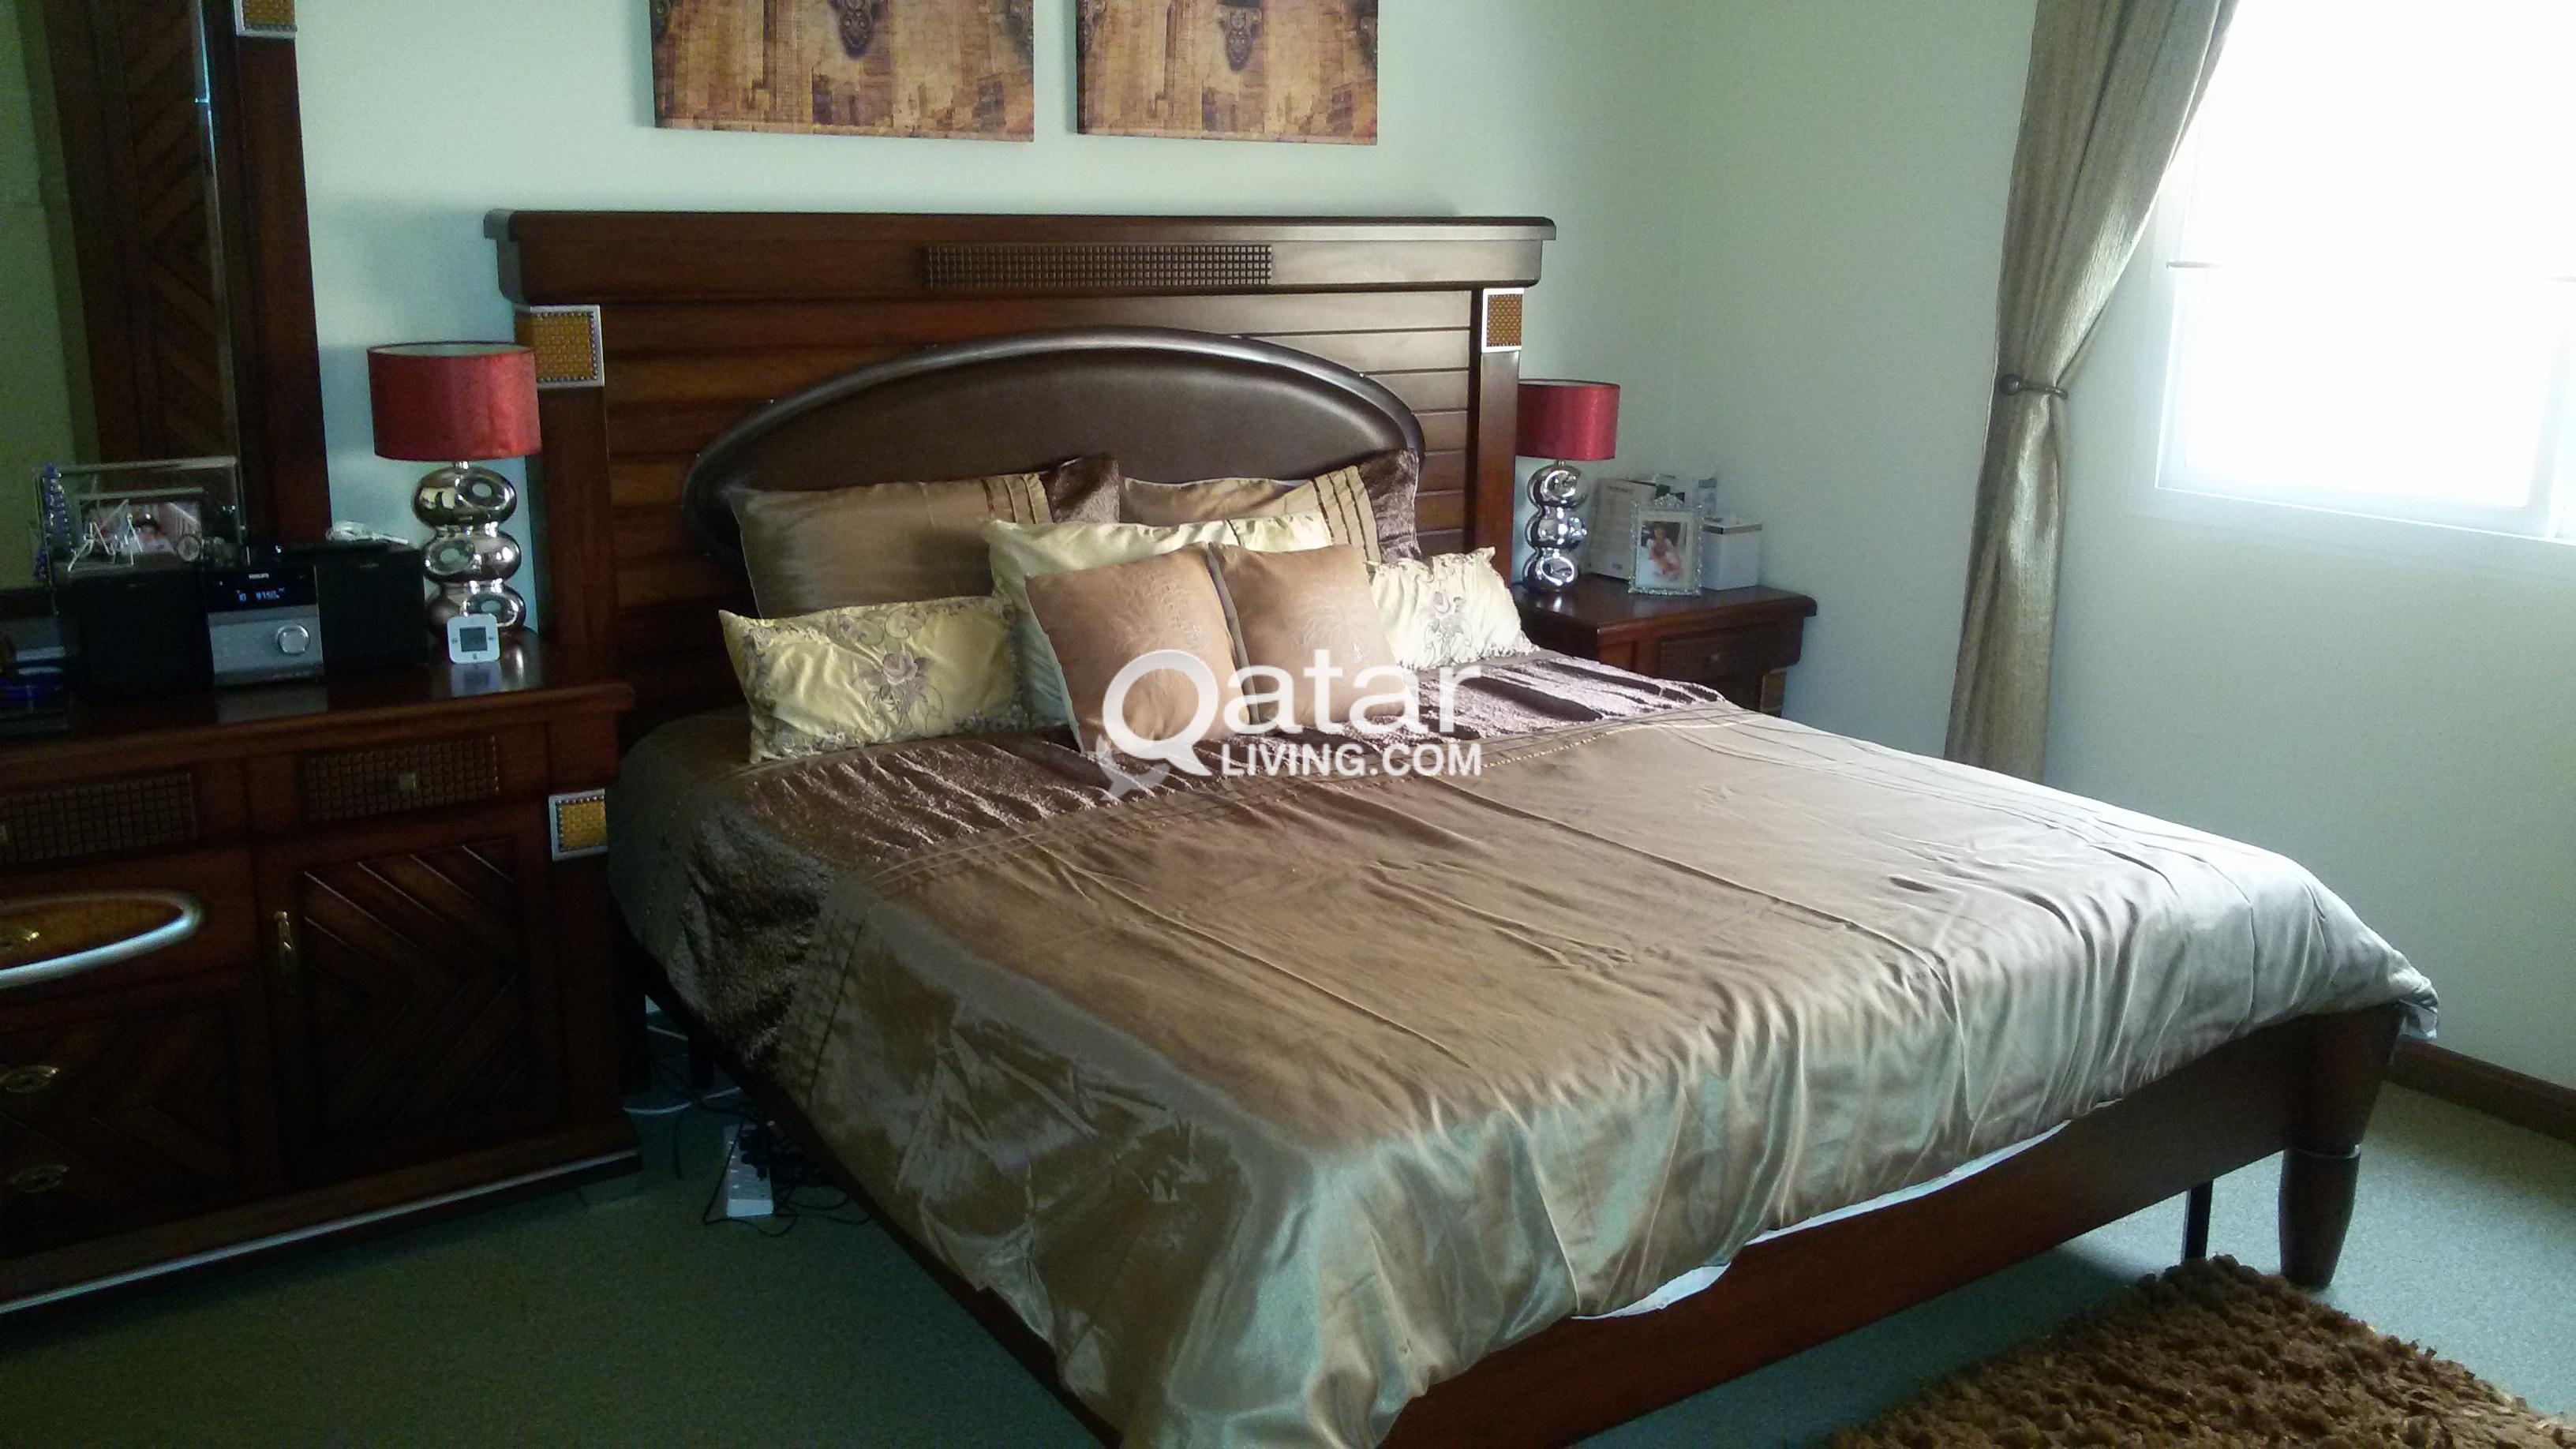 Remarkable Homes R Us 5 Piece Bedroom Set For Sale Qatar Living Download Free Architecture Designs Intelgarnamadebymaigaardcom